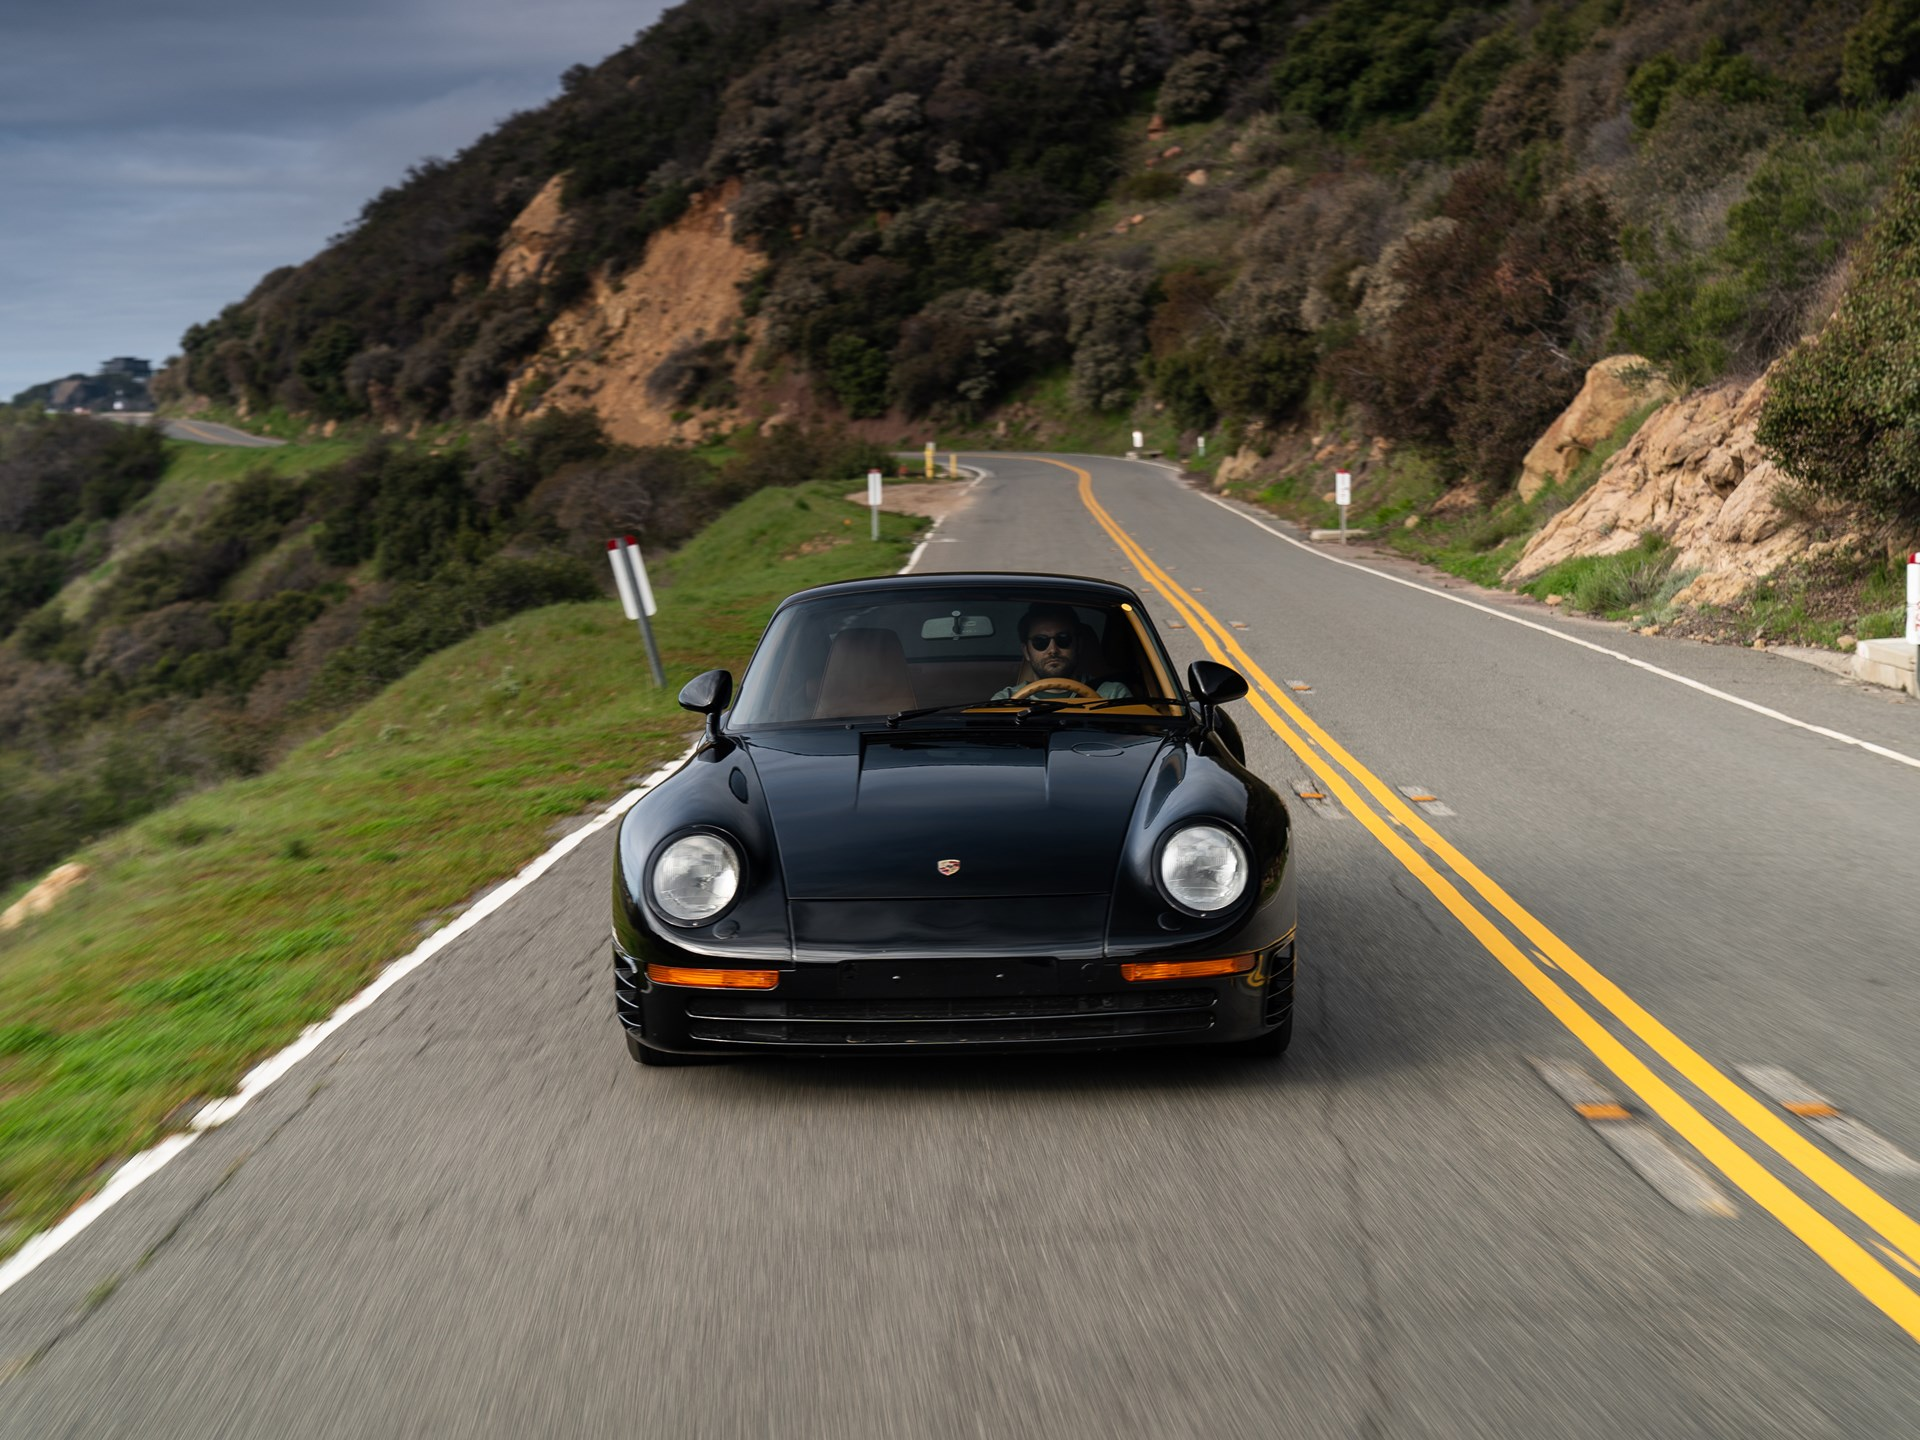 1988 Porsche 959 Komfort front on road